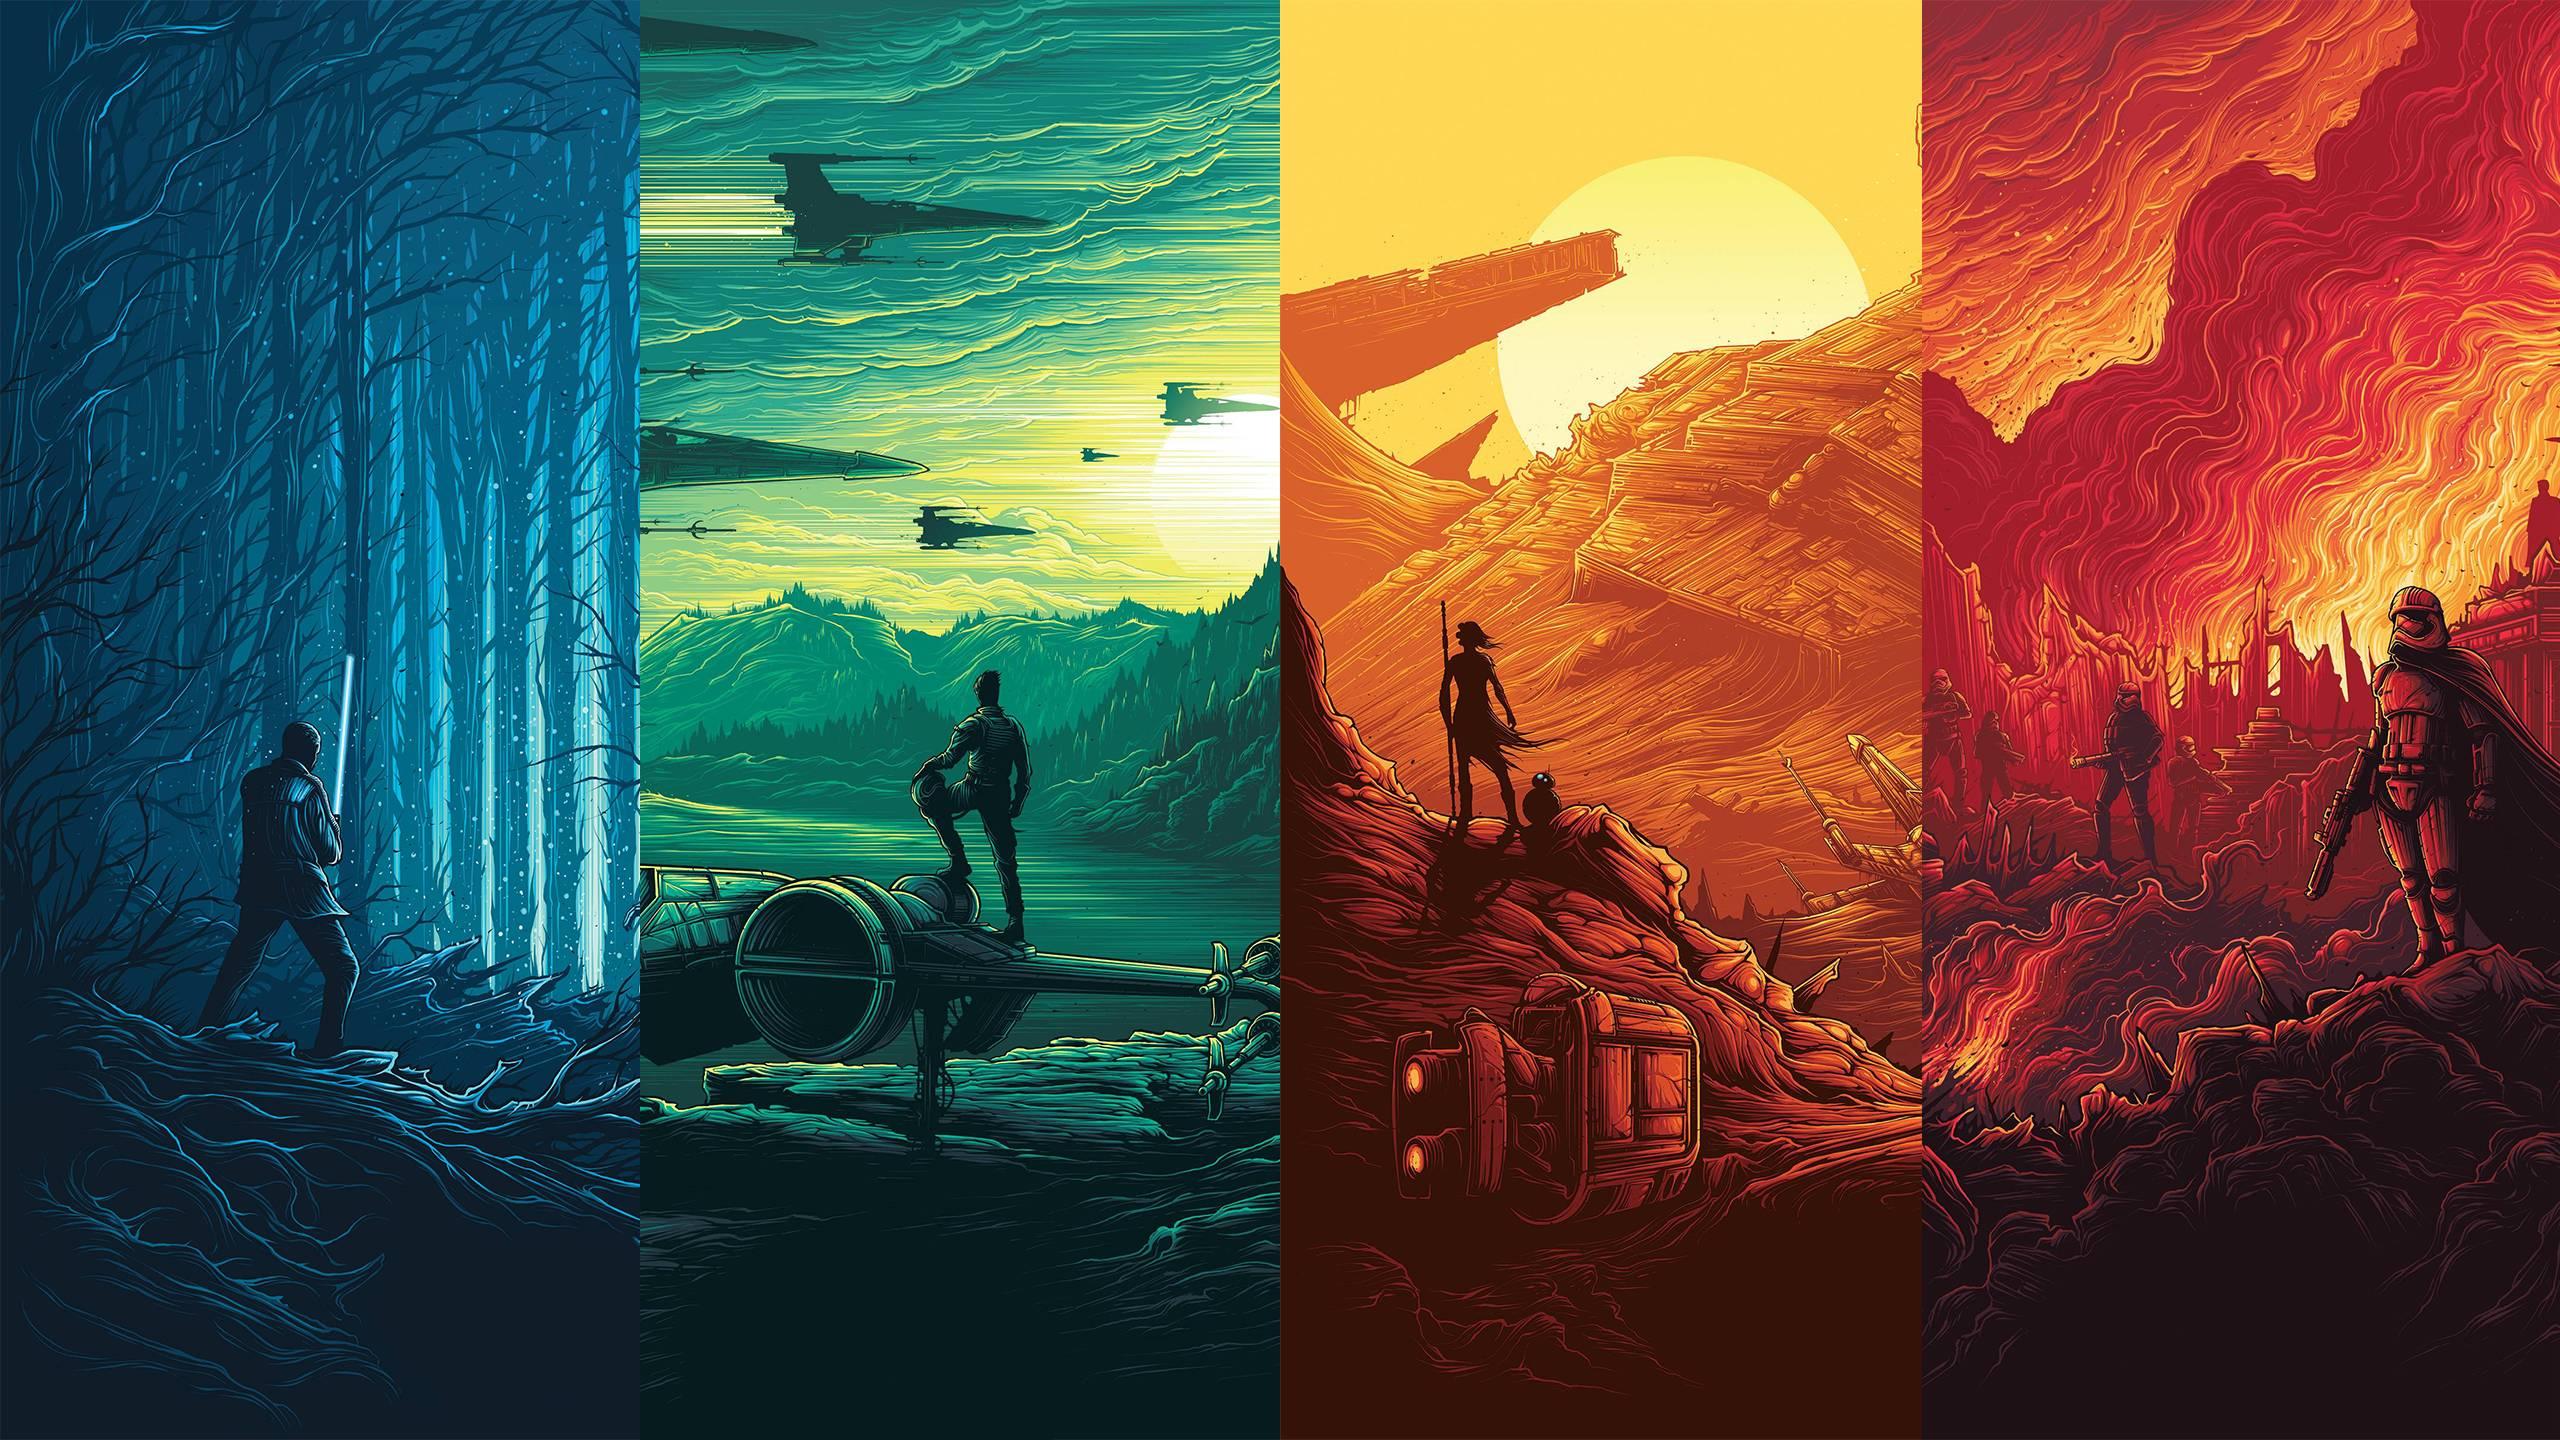 Starwars Star Wars The Force Awakens Painting 8774 Hd